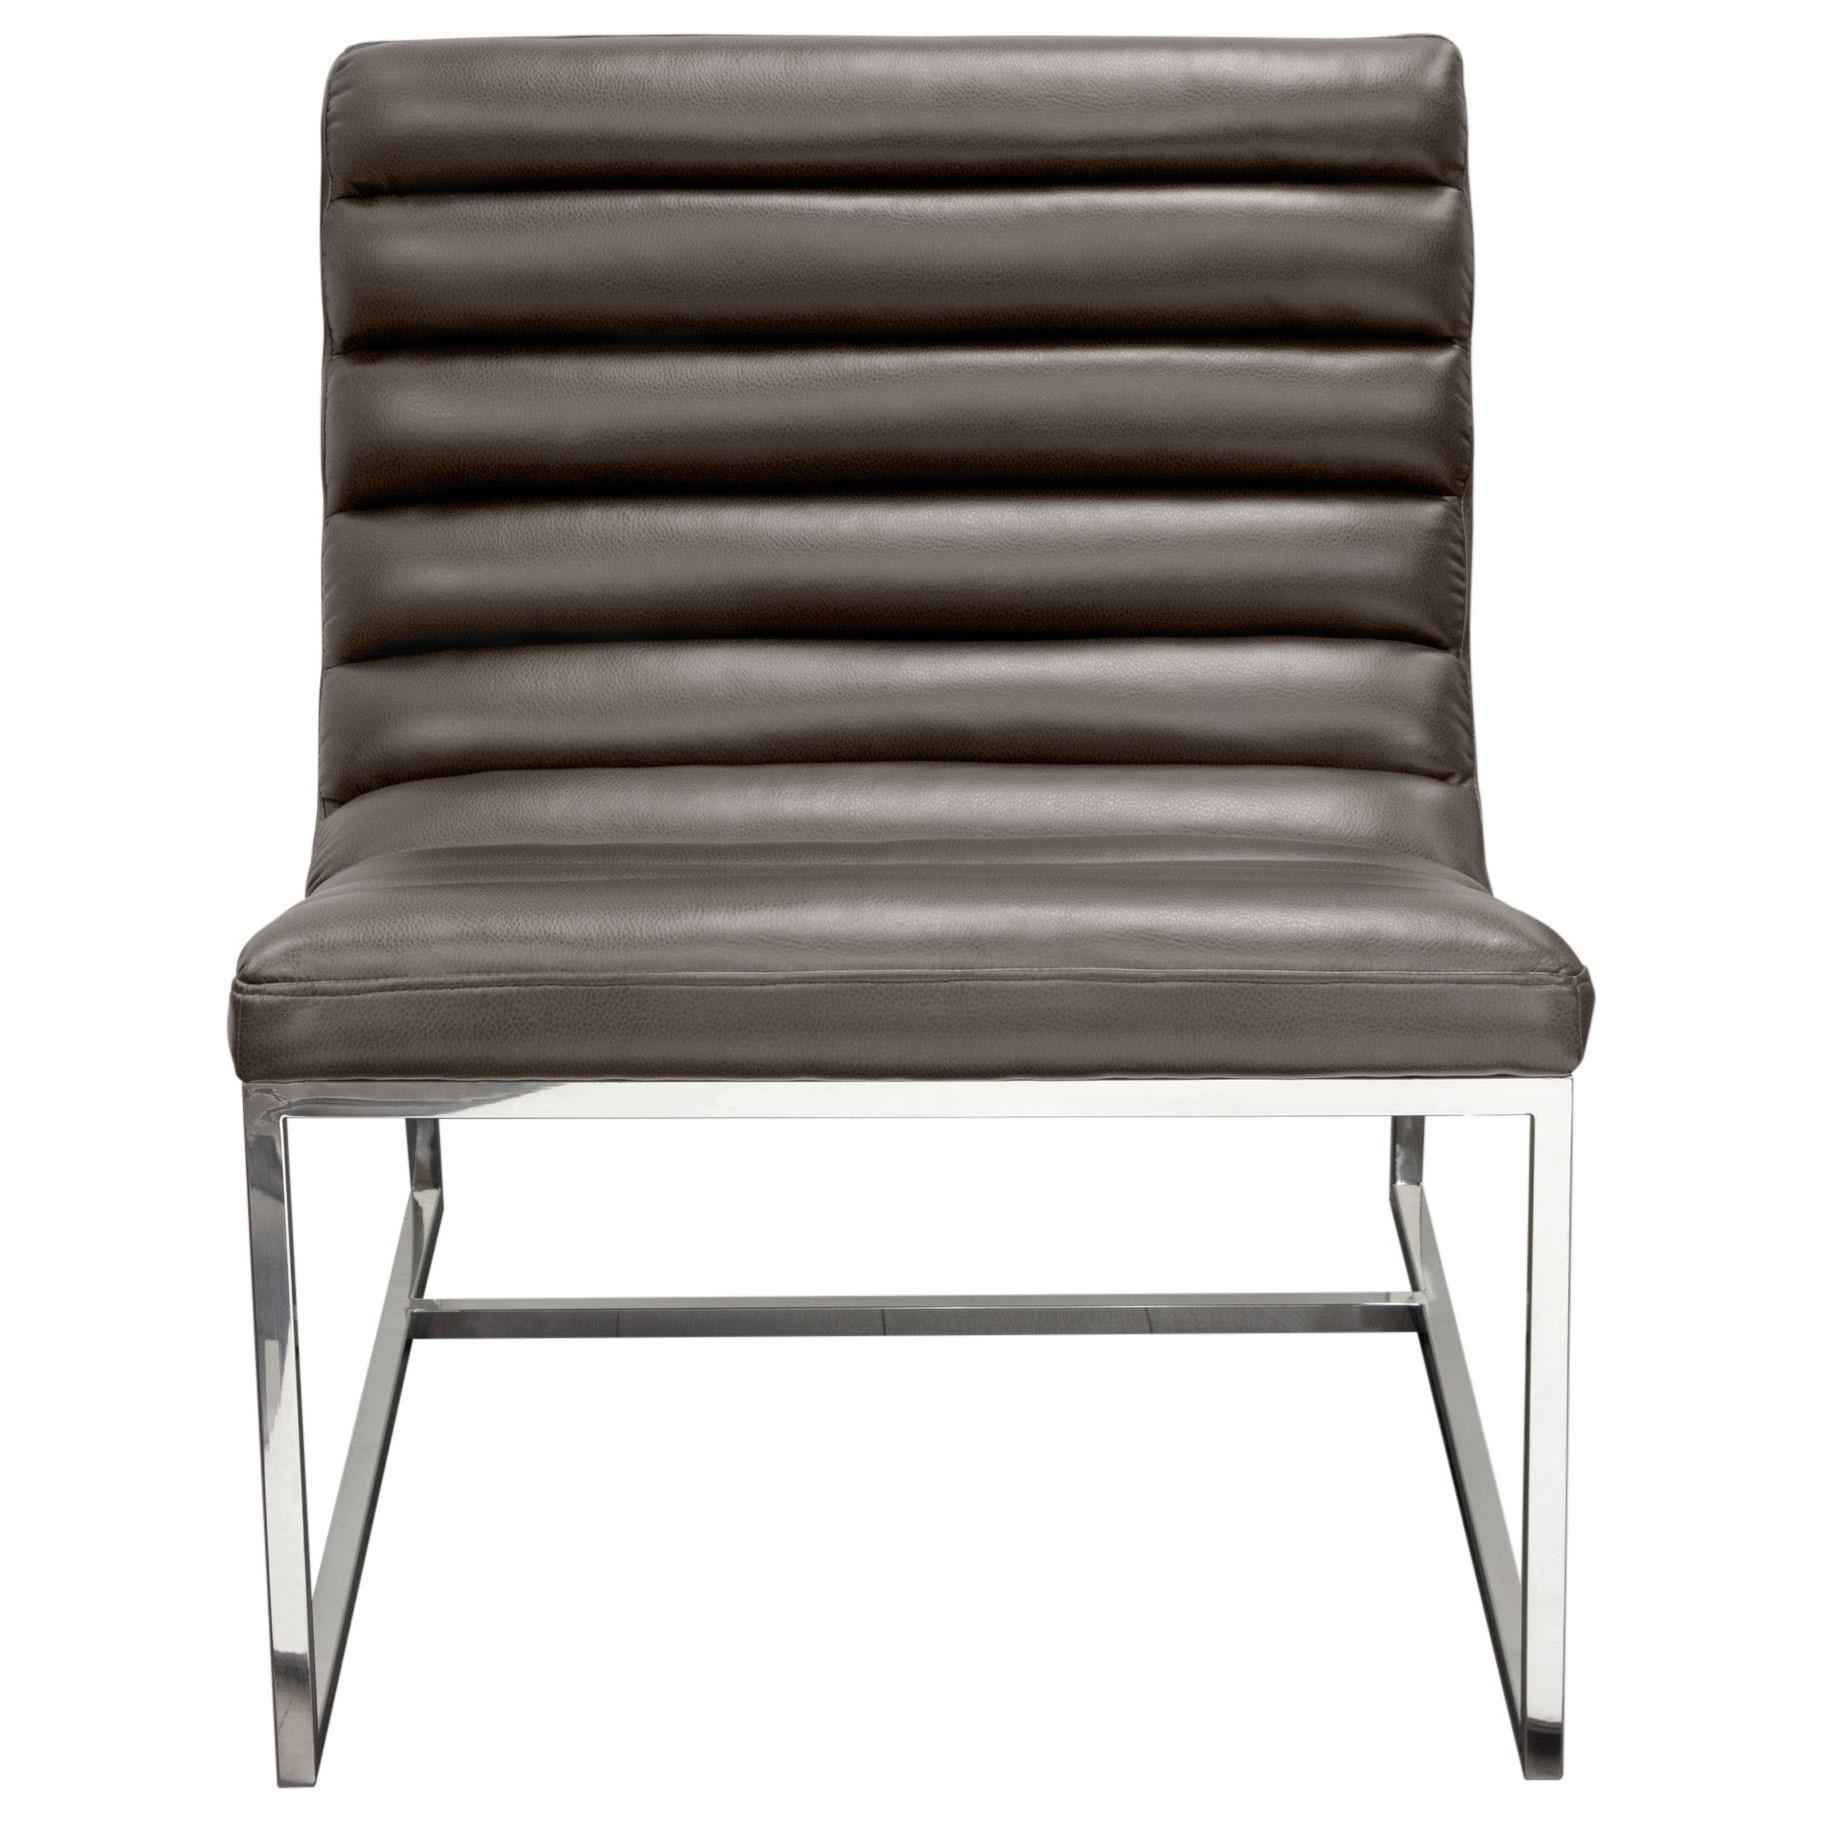 Bardot Grey Lounge Chair by Diamond Sofa at Red Knot